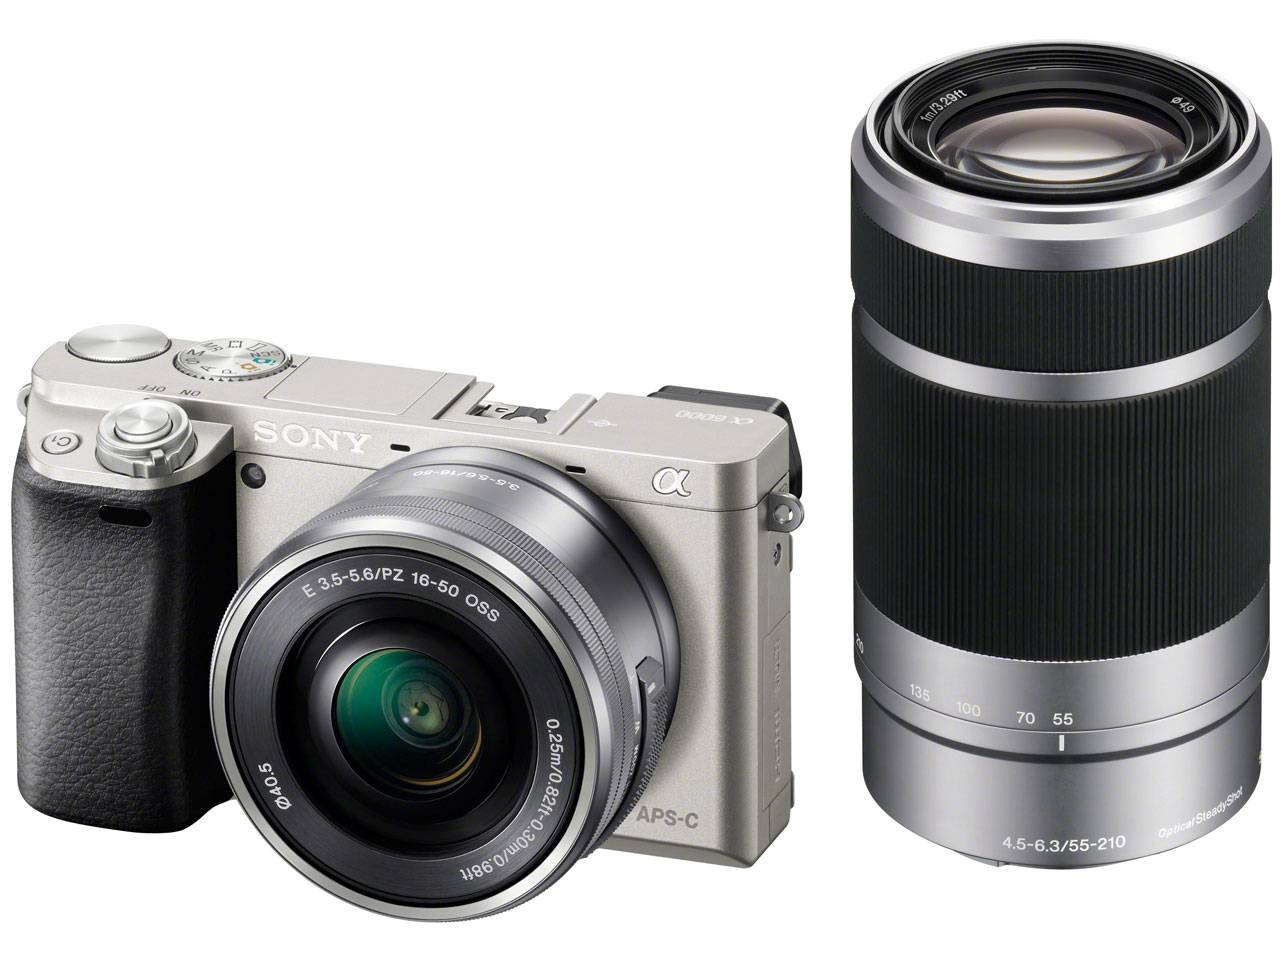 Sony Alpha A6000 + 16-50mm + 55-210mm - Argento - 4 Anni Di Garanzia